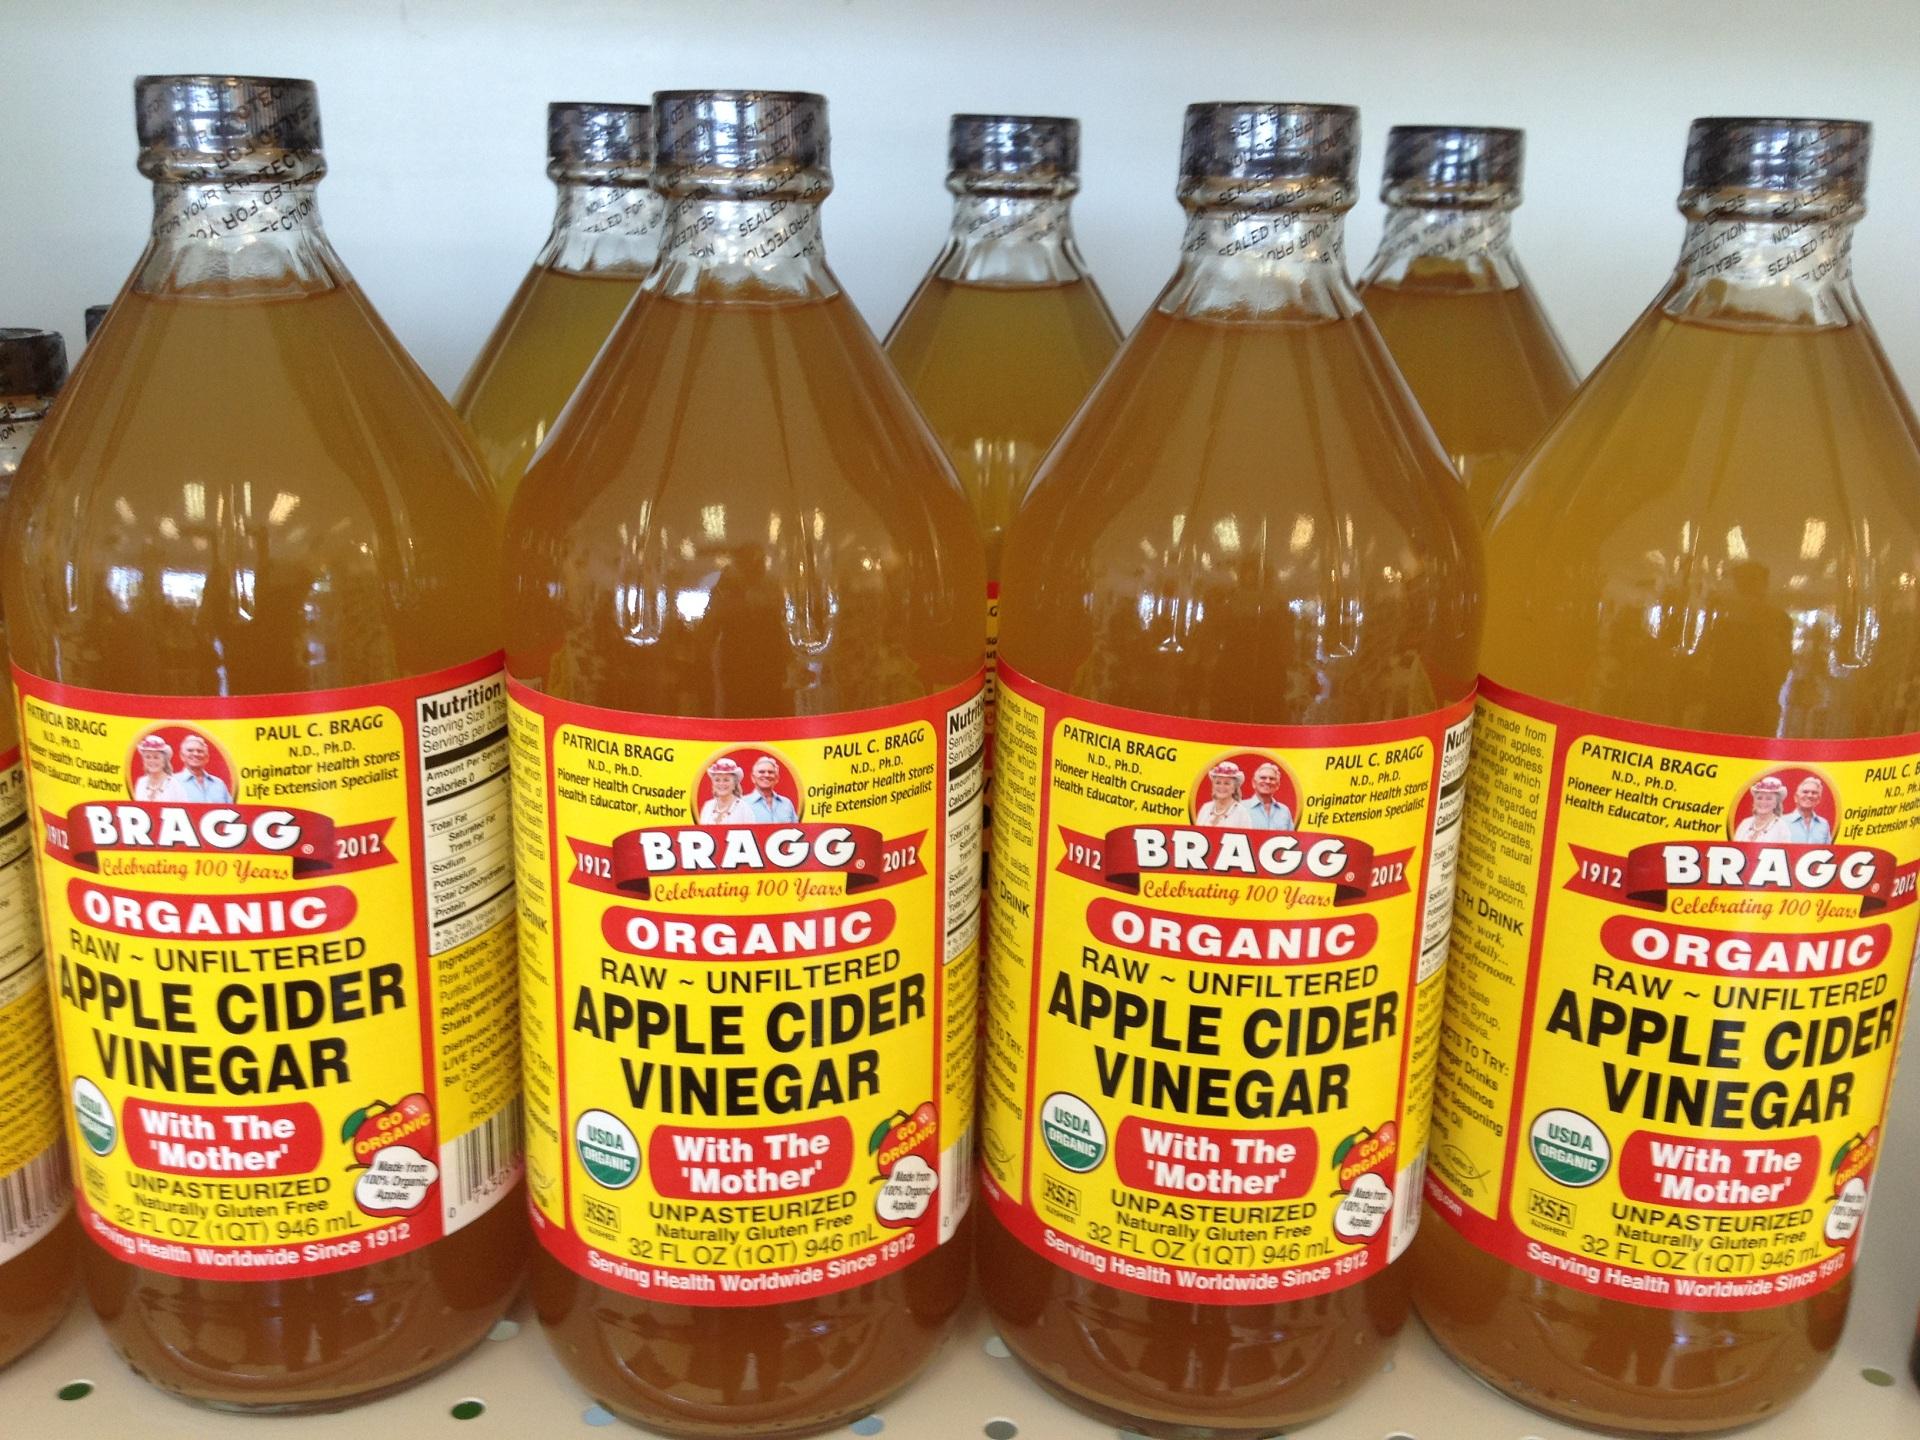 home remedies for diarrhea - Apple cider vinegar